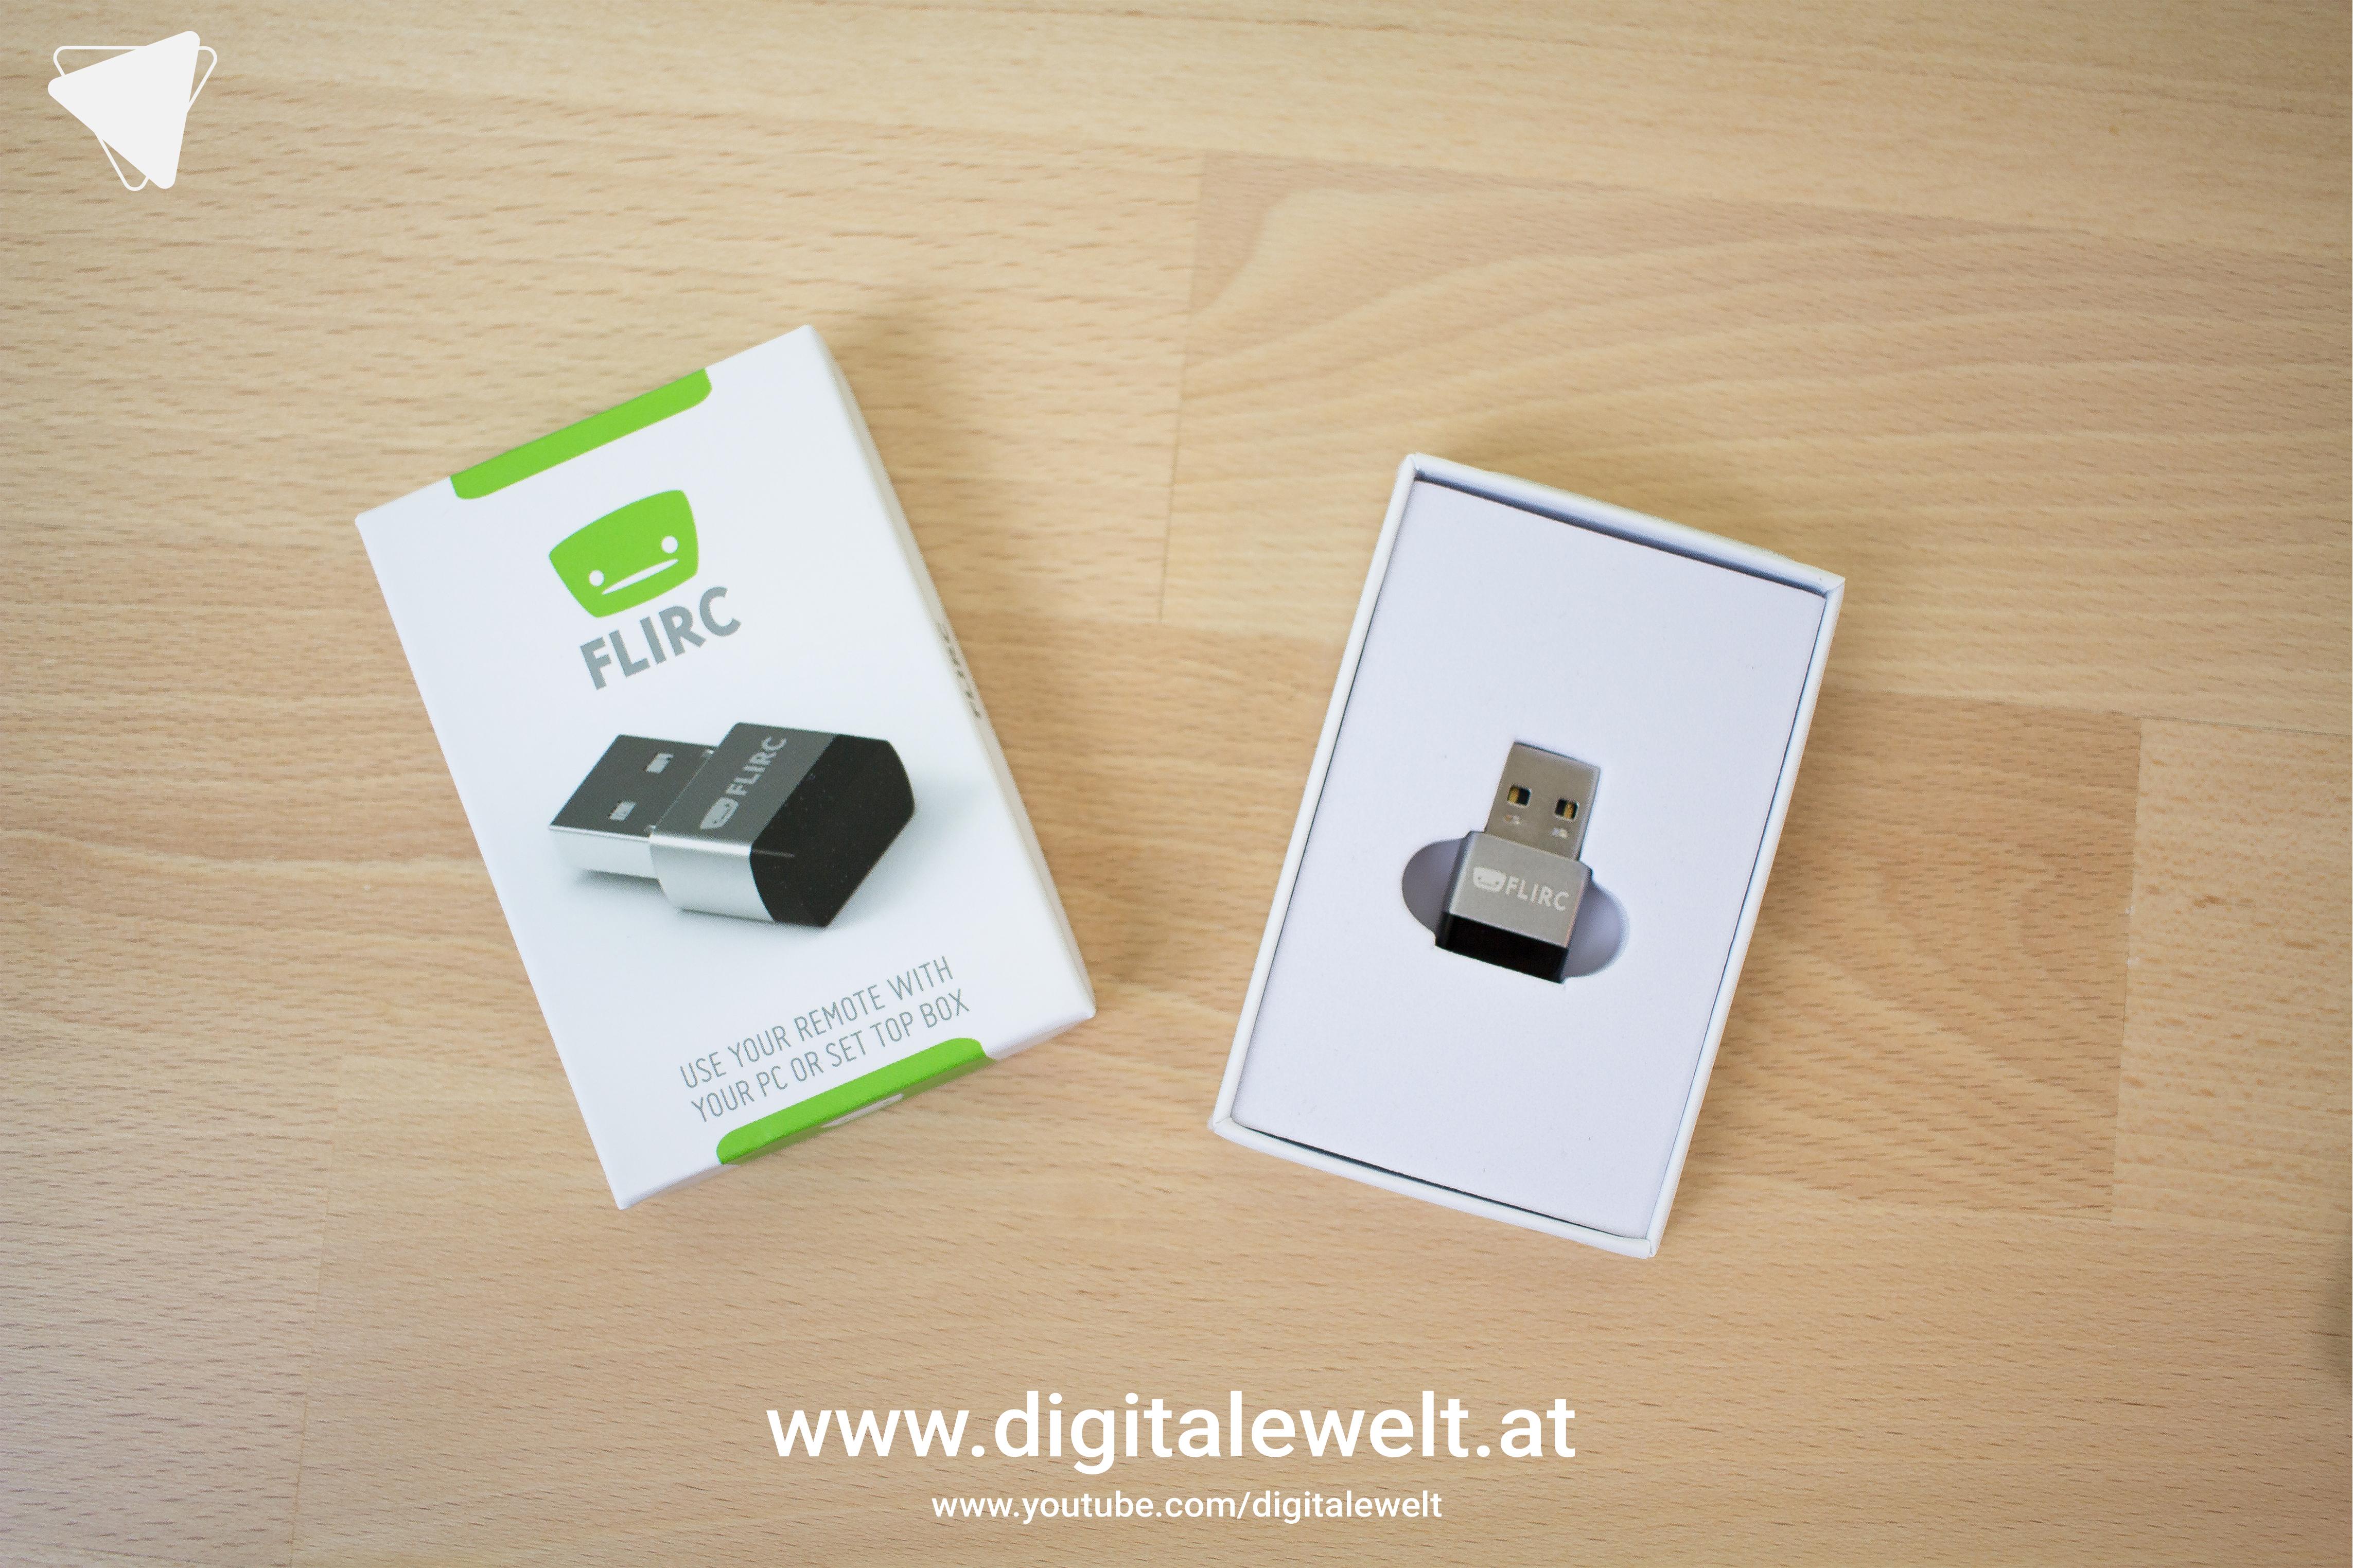 FLIRC USB Empfänger (IR Remote) - DigitaleWelt